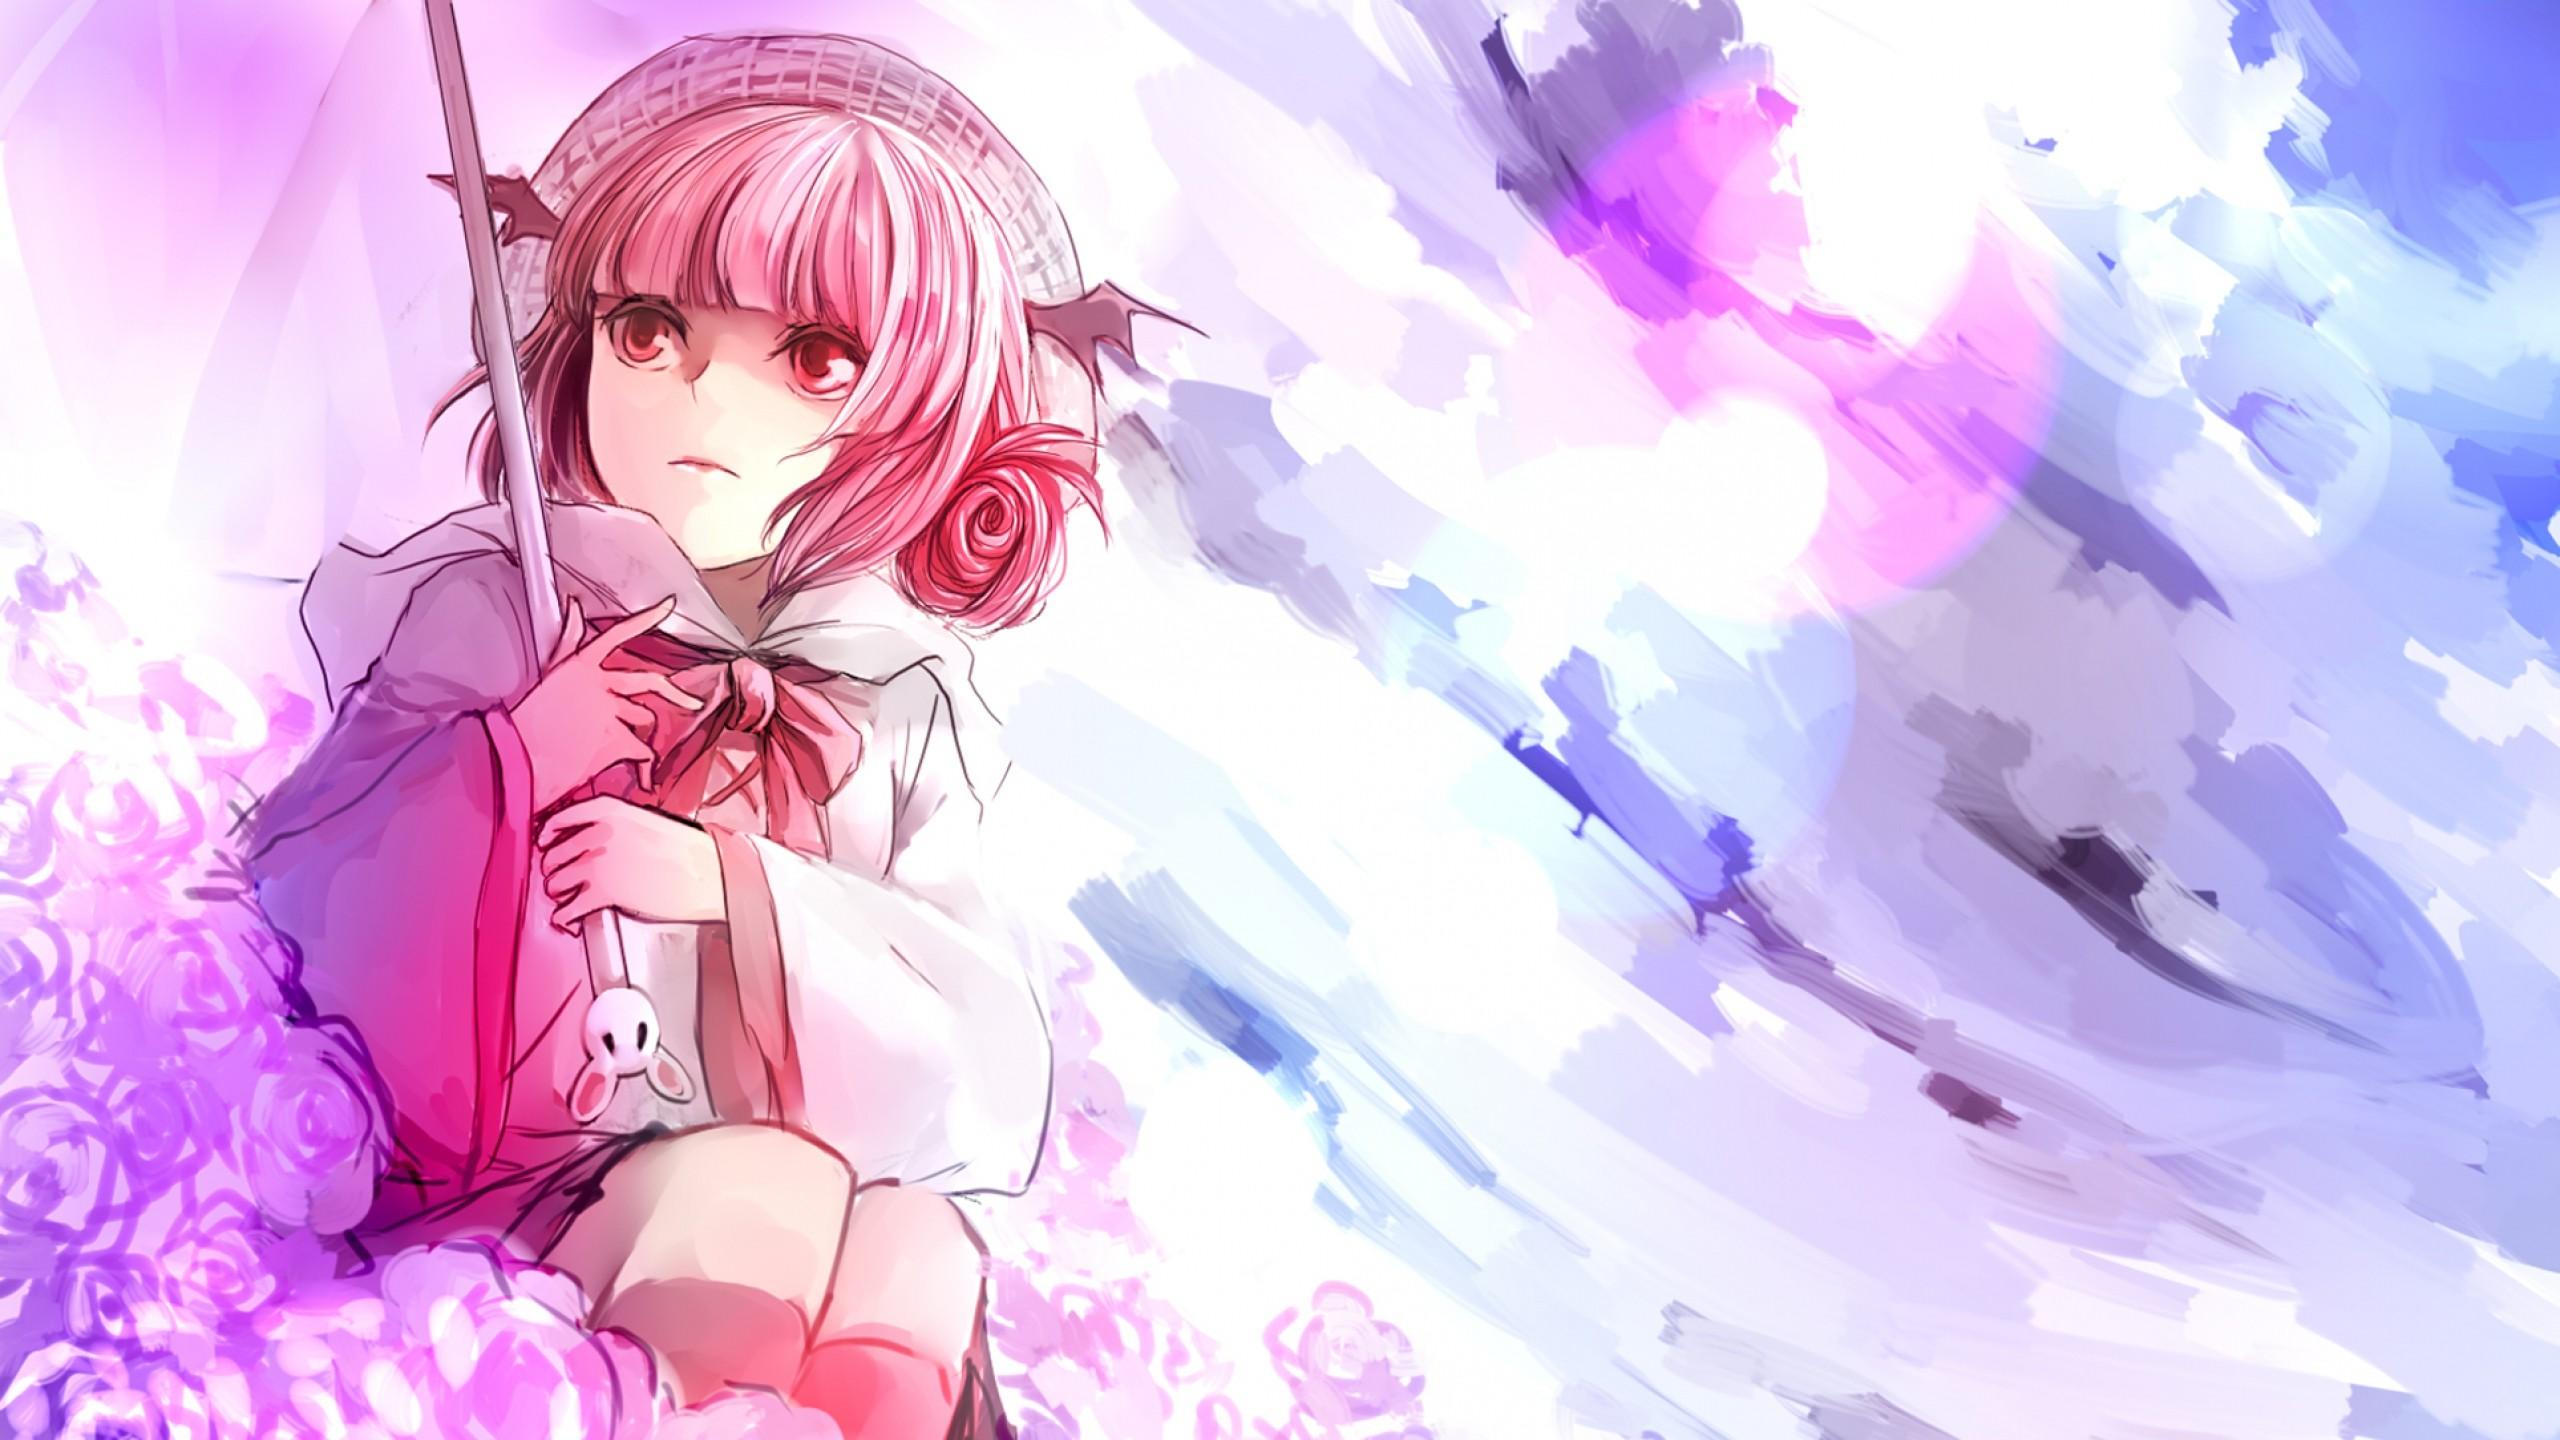 Wallpaper anime, girl, art, umbrella, flowers, pink